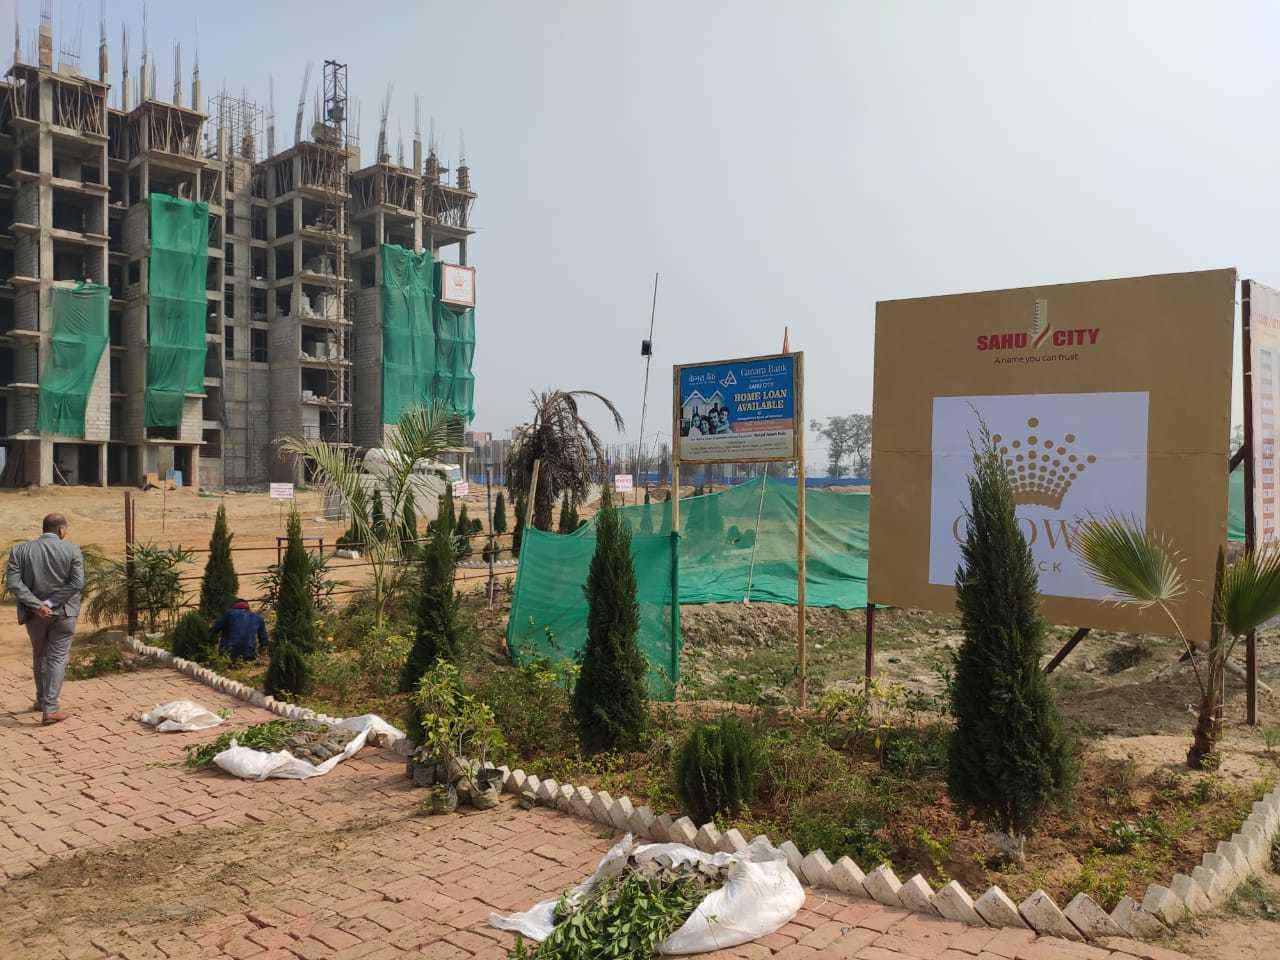 sahu city sultanpur road luckn